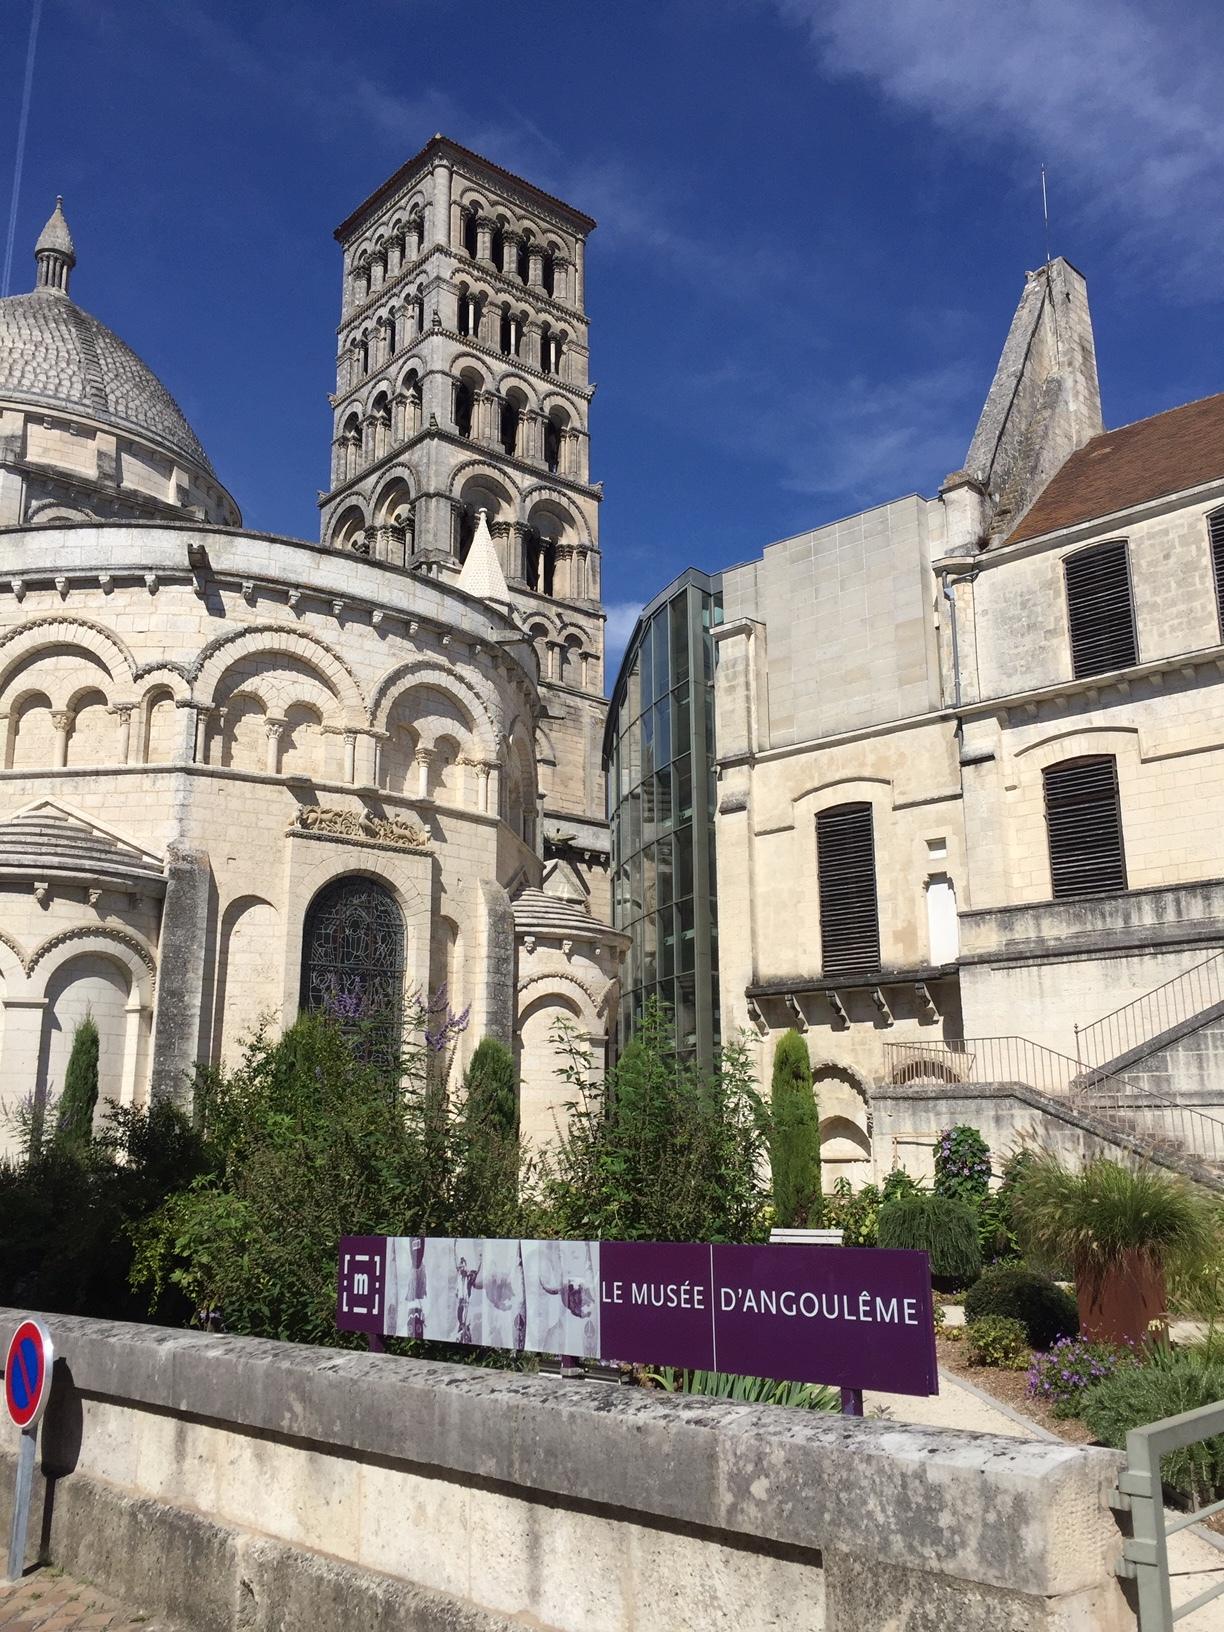 Angouleme Museum